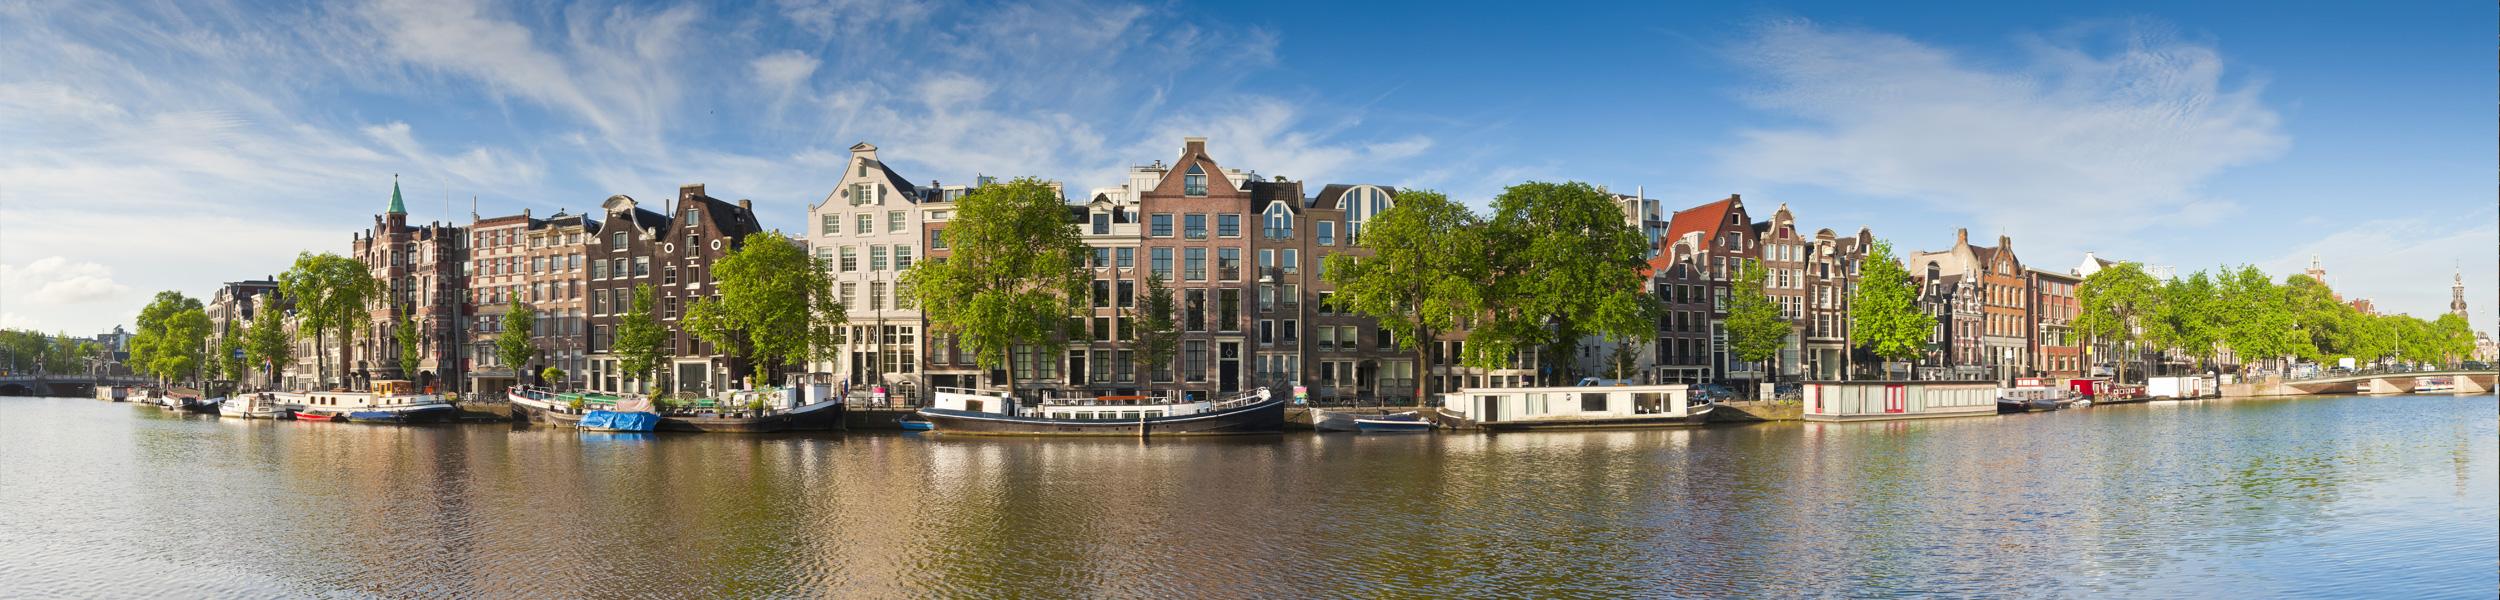 React Engineer Amsterdam, The Netherlands